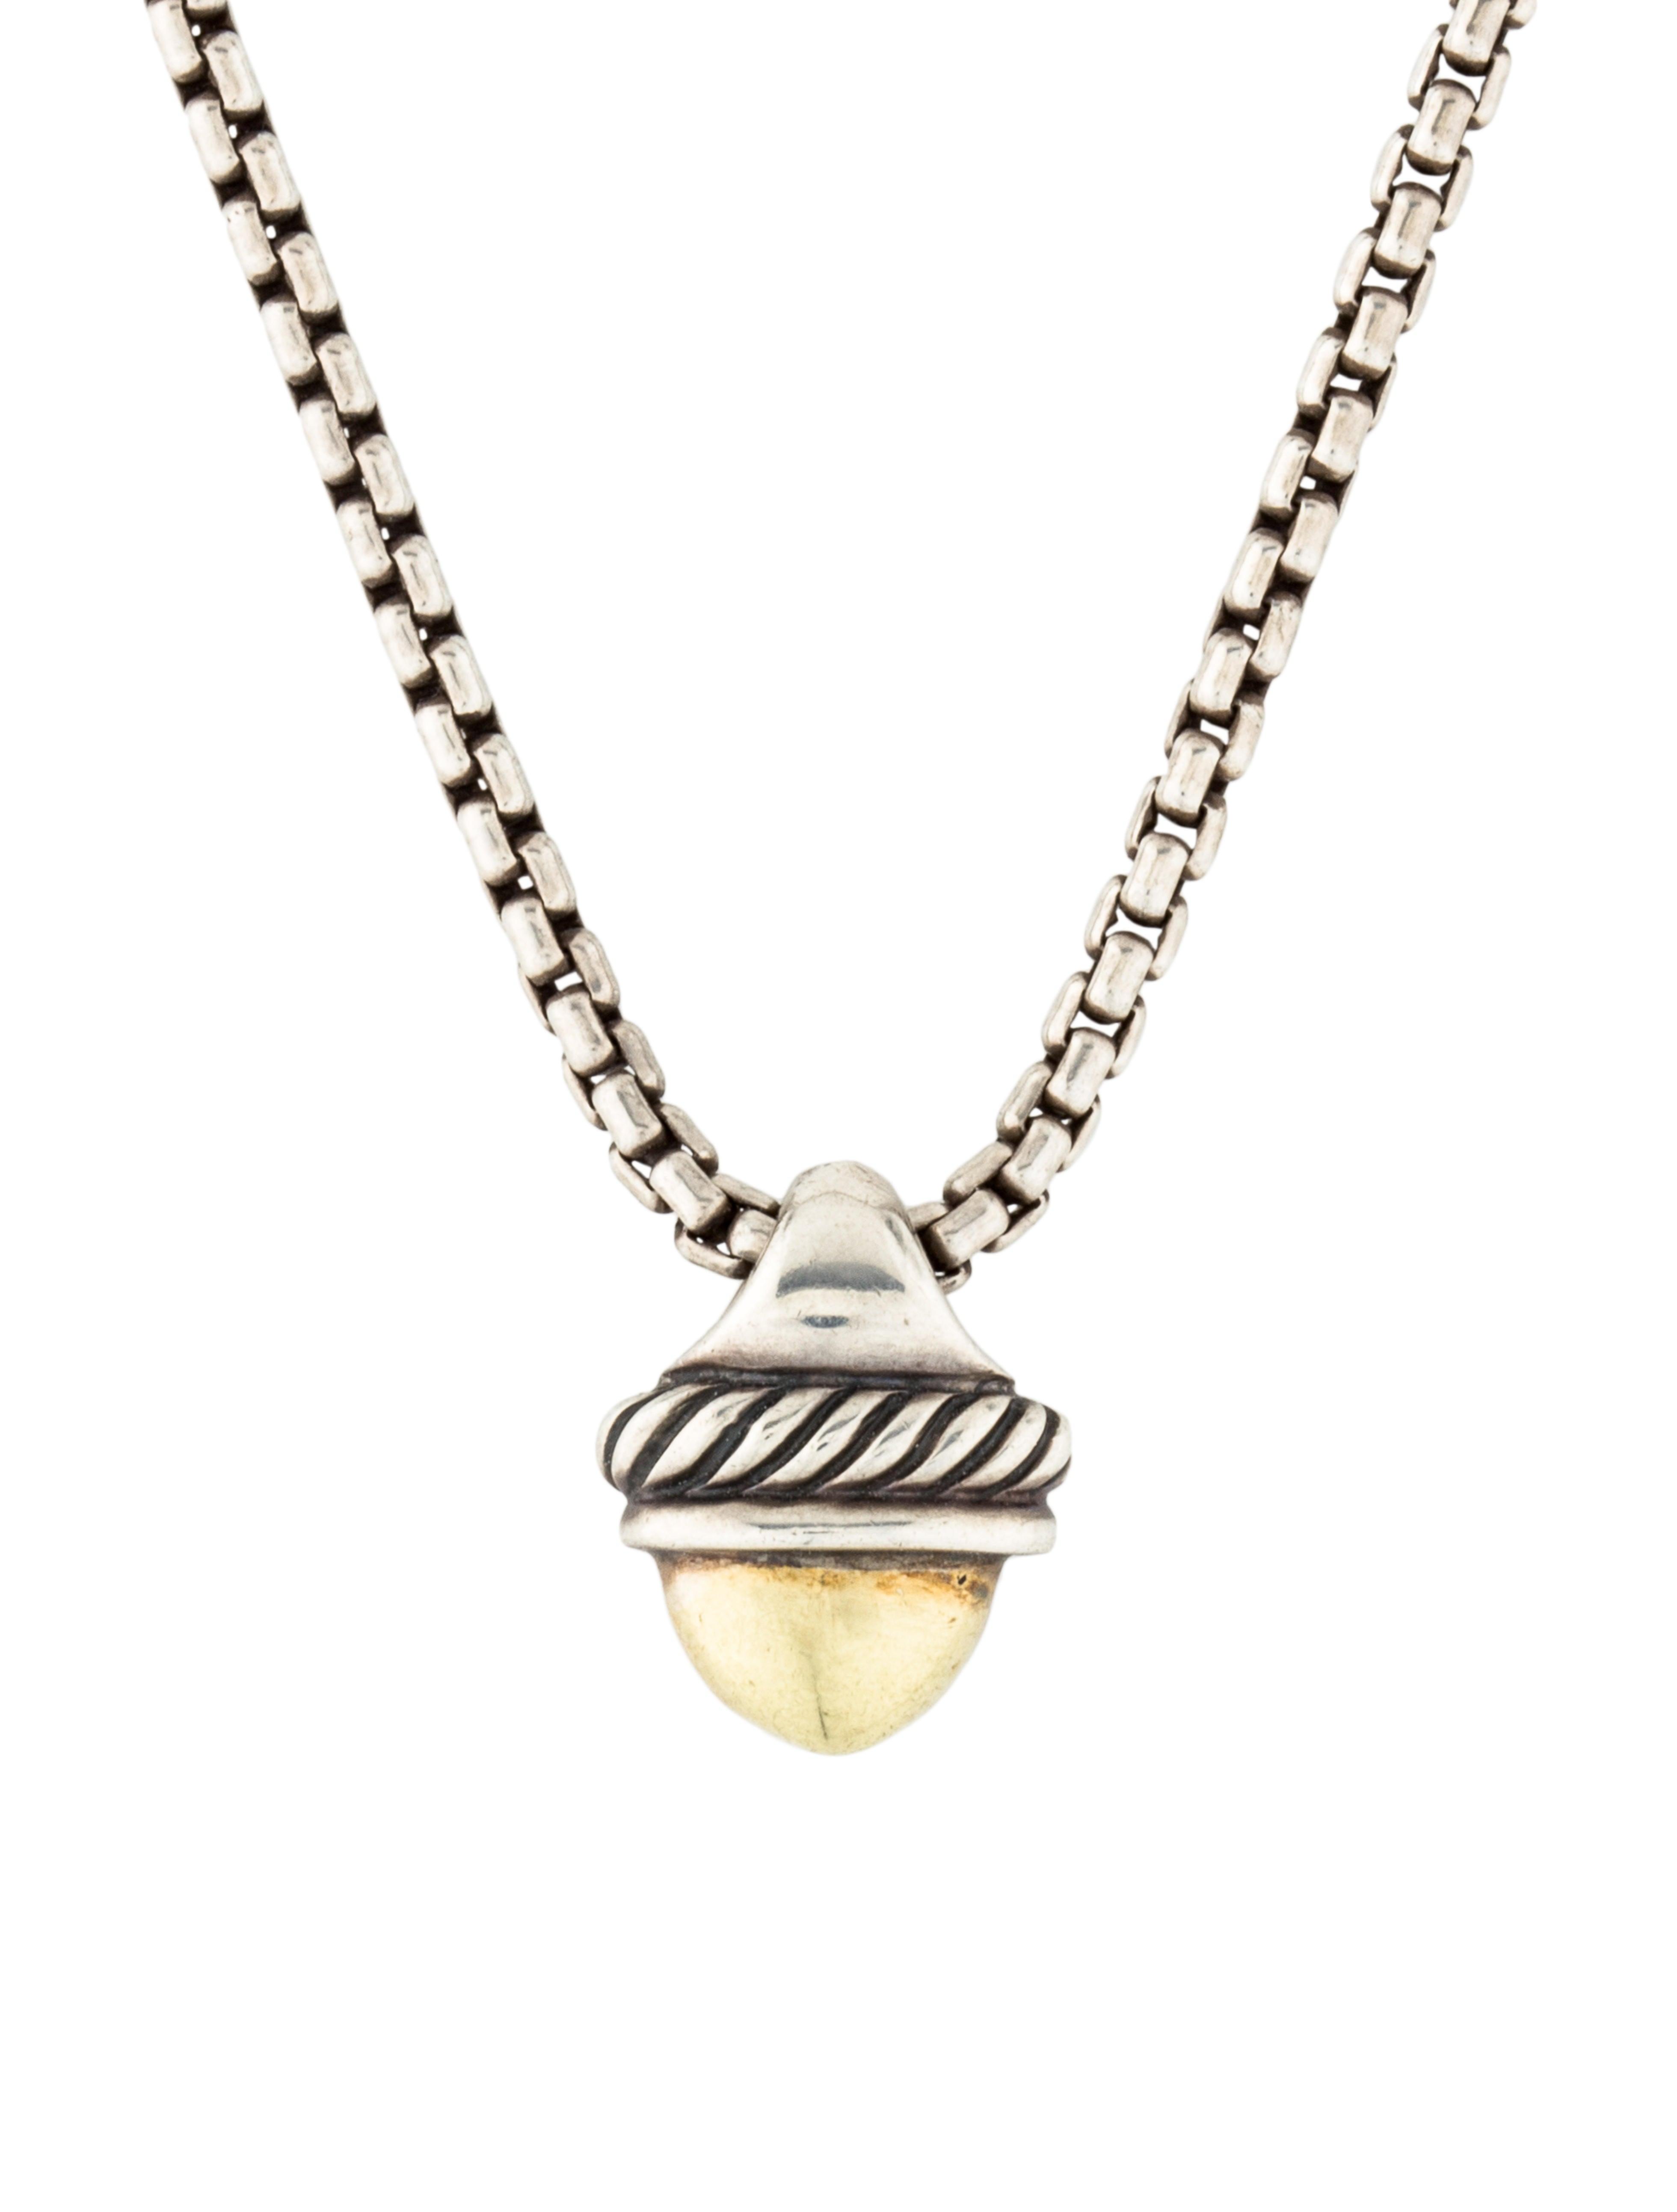 David yurman two tone acorn pendant necklace necklaces two tone acorn pendant necklace mozeypictures Image collections